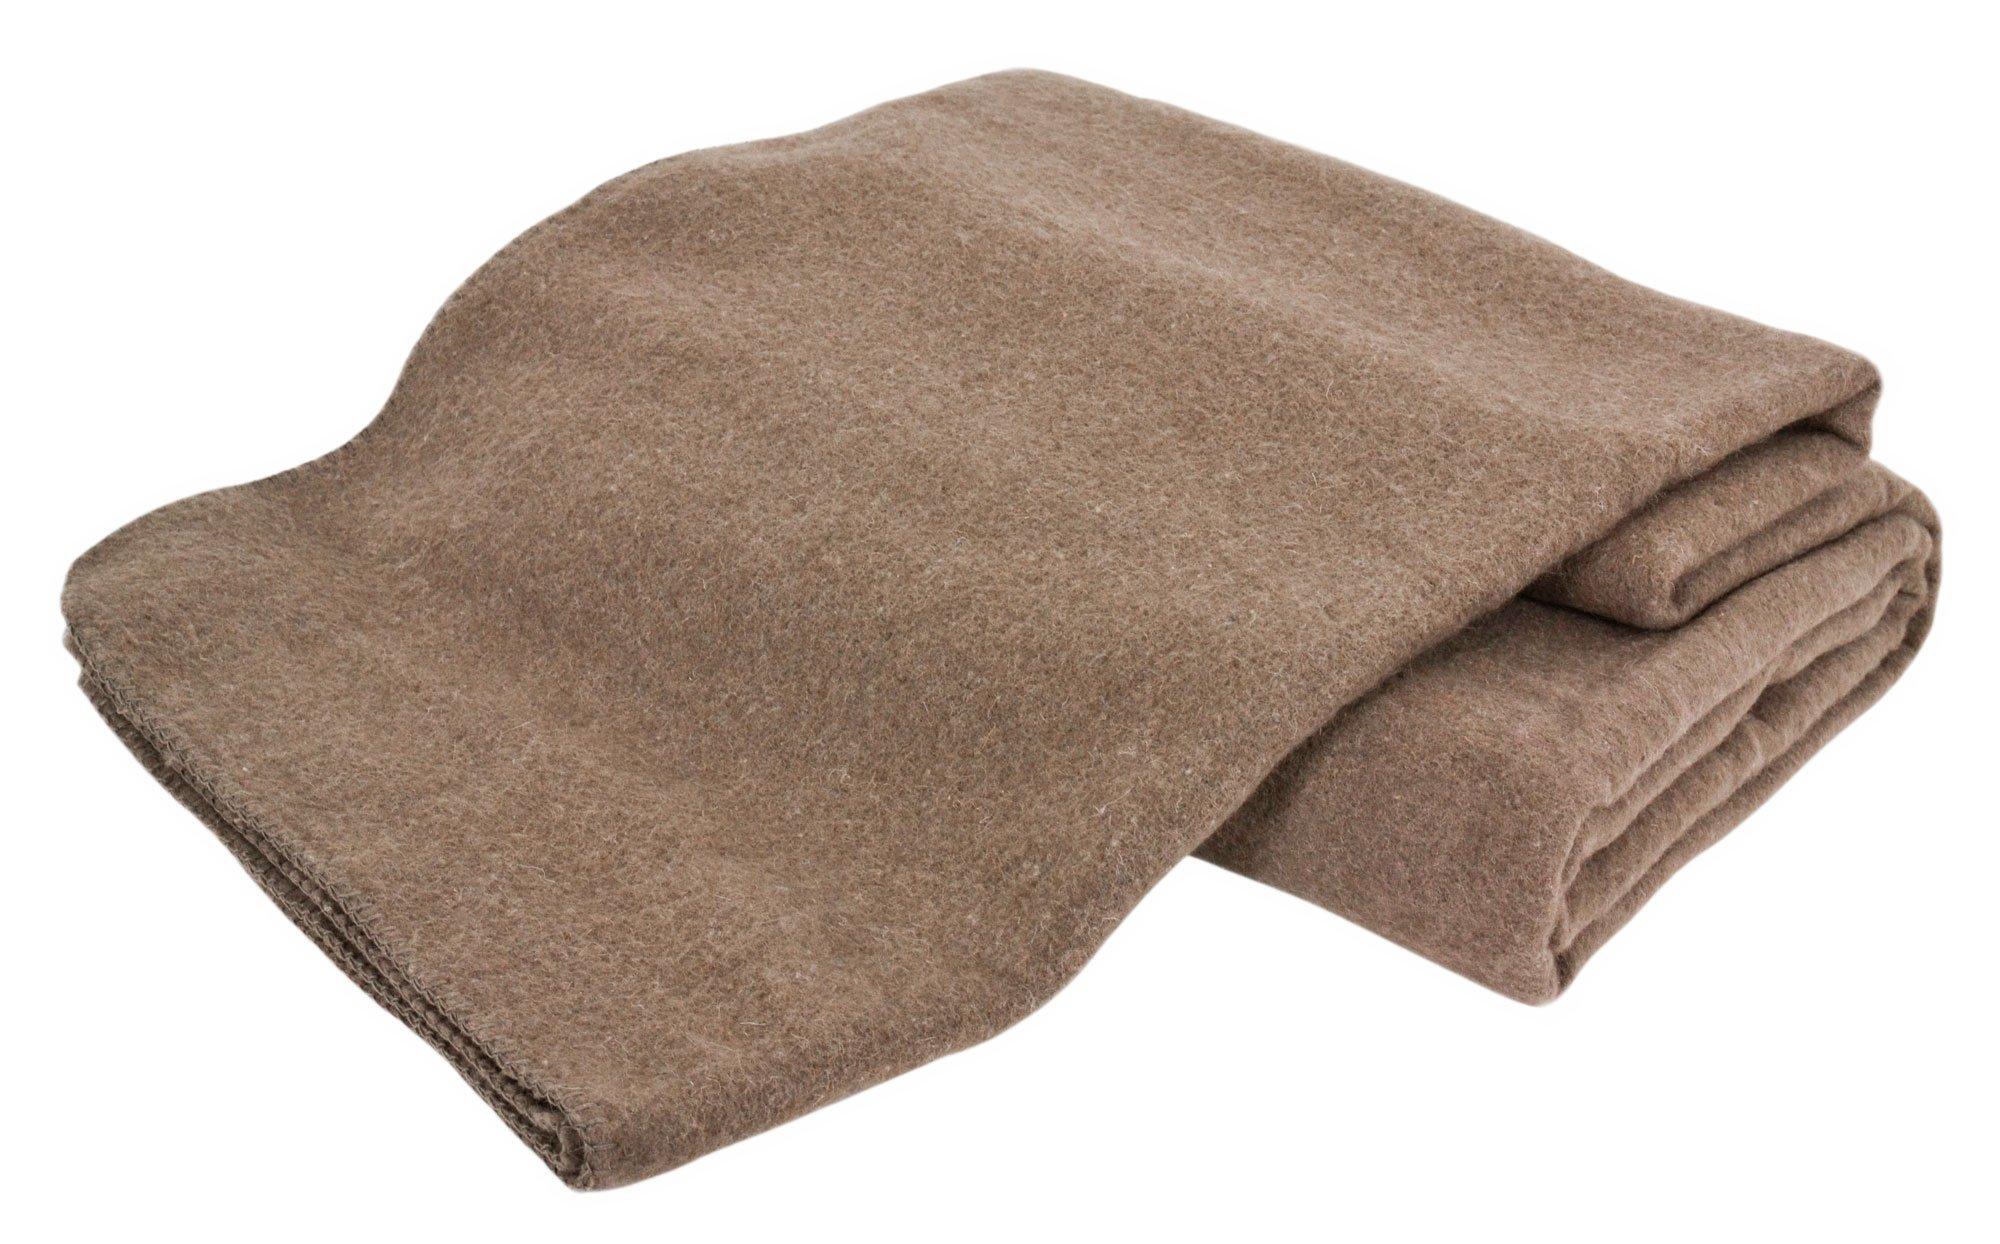 Creswick Australian Mills Hobart Machine Washable Australian Wool Blend Blanket, King, Hazel